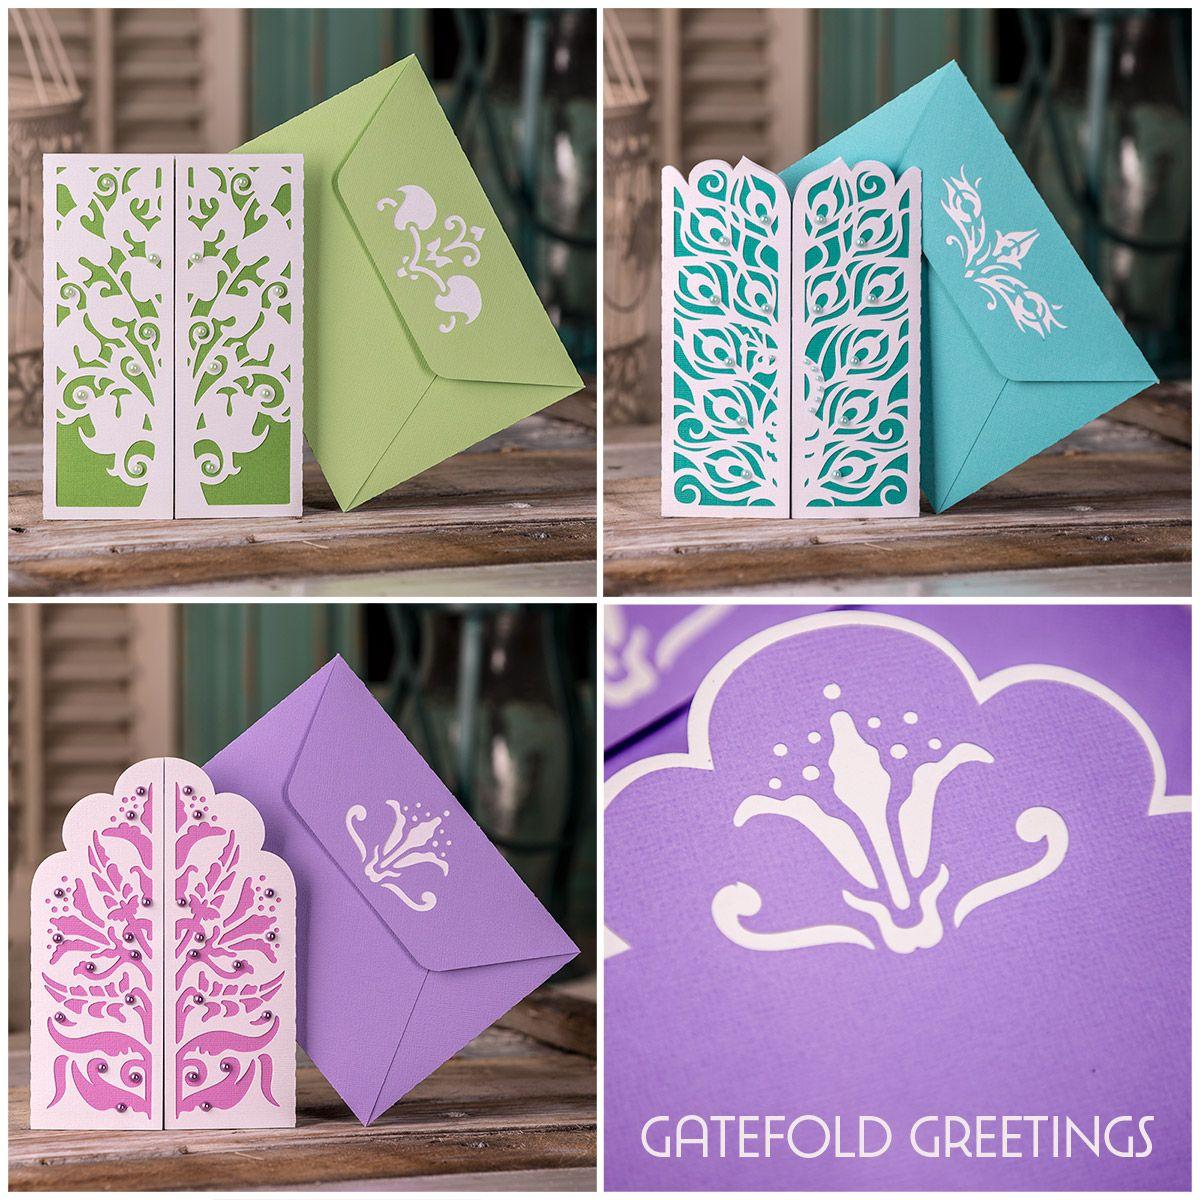 Gatefold Greetings Svg Bundle Dreaming Tree Tree Wedding Invitations Greetings Gatefold Cards